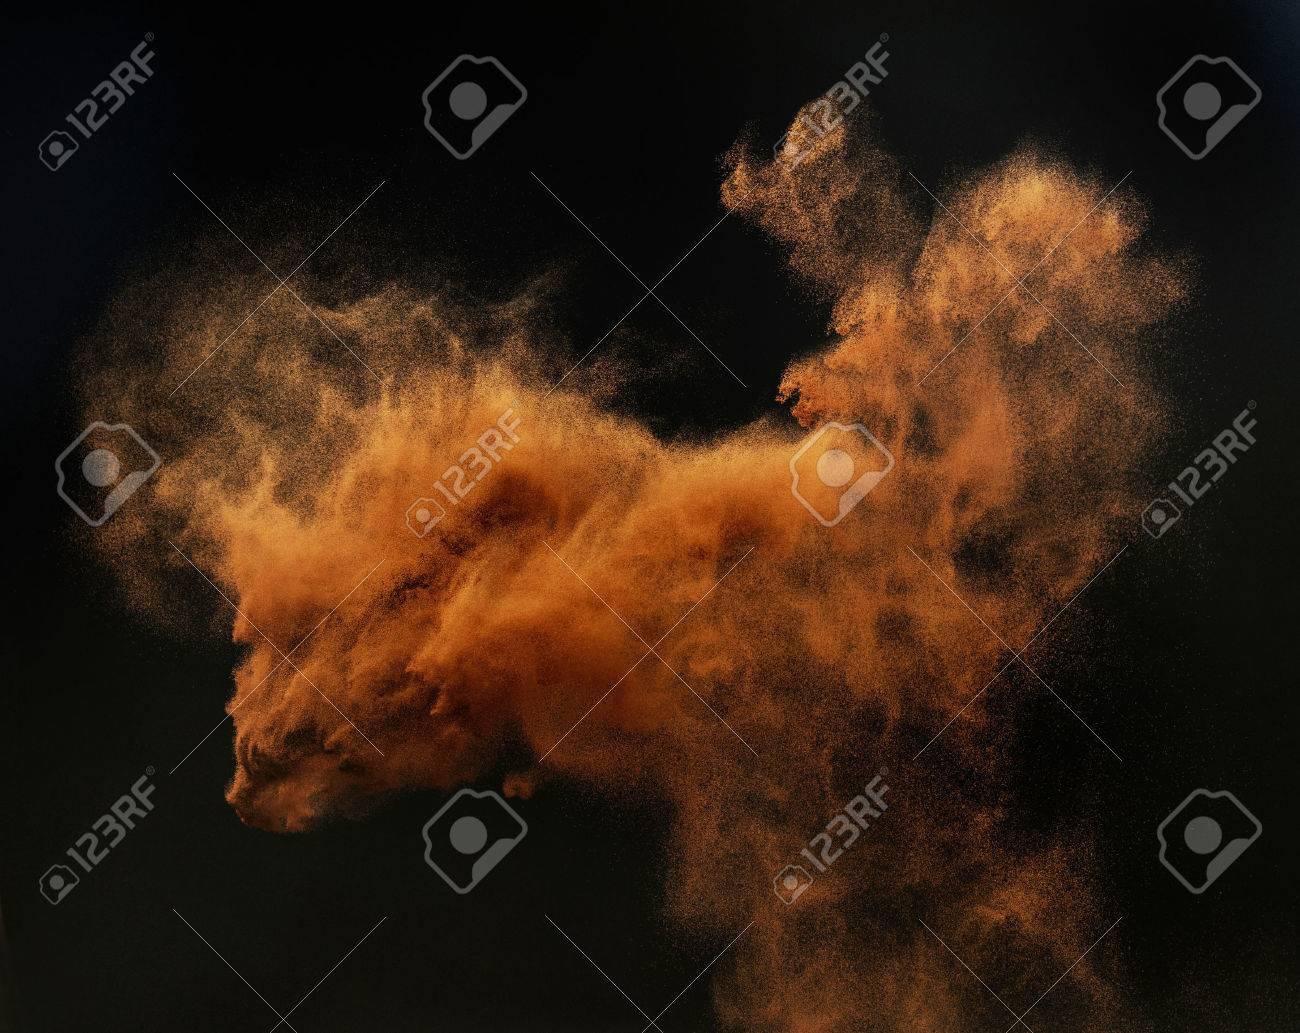 Ginger cloud of a magic sand Archivio Fotografico - 50424571